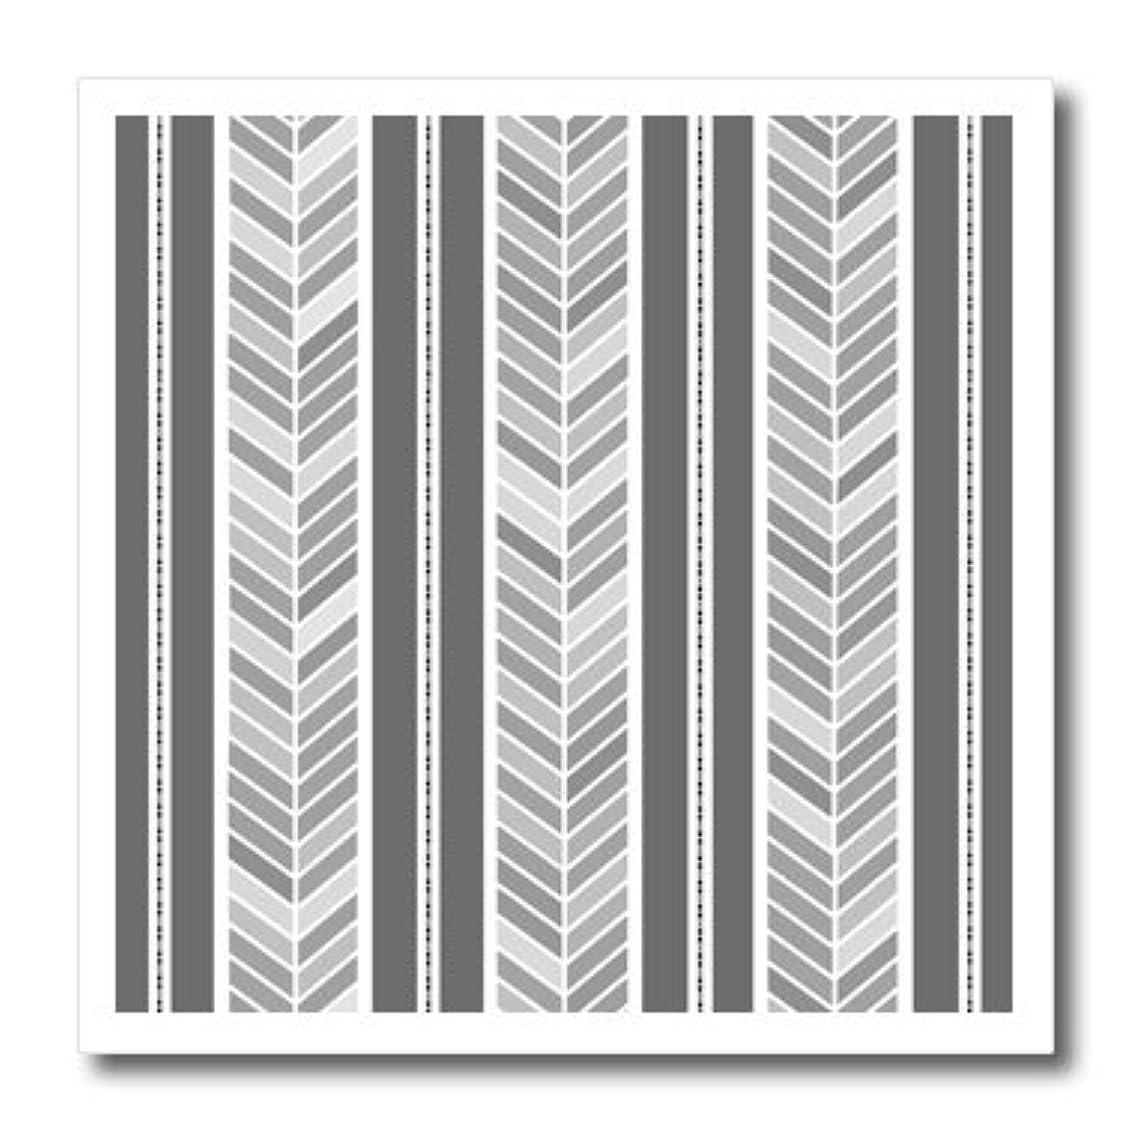 3dRose ht_193769_3 Grey Herringbone Pattern Gray Tribal Chevron Arrow Feather Stripes Iron on Heat Transfer, 10 by 10